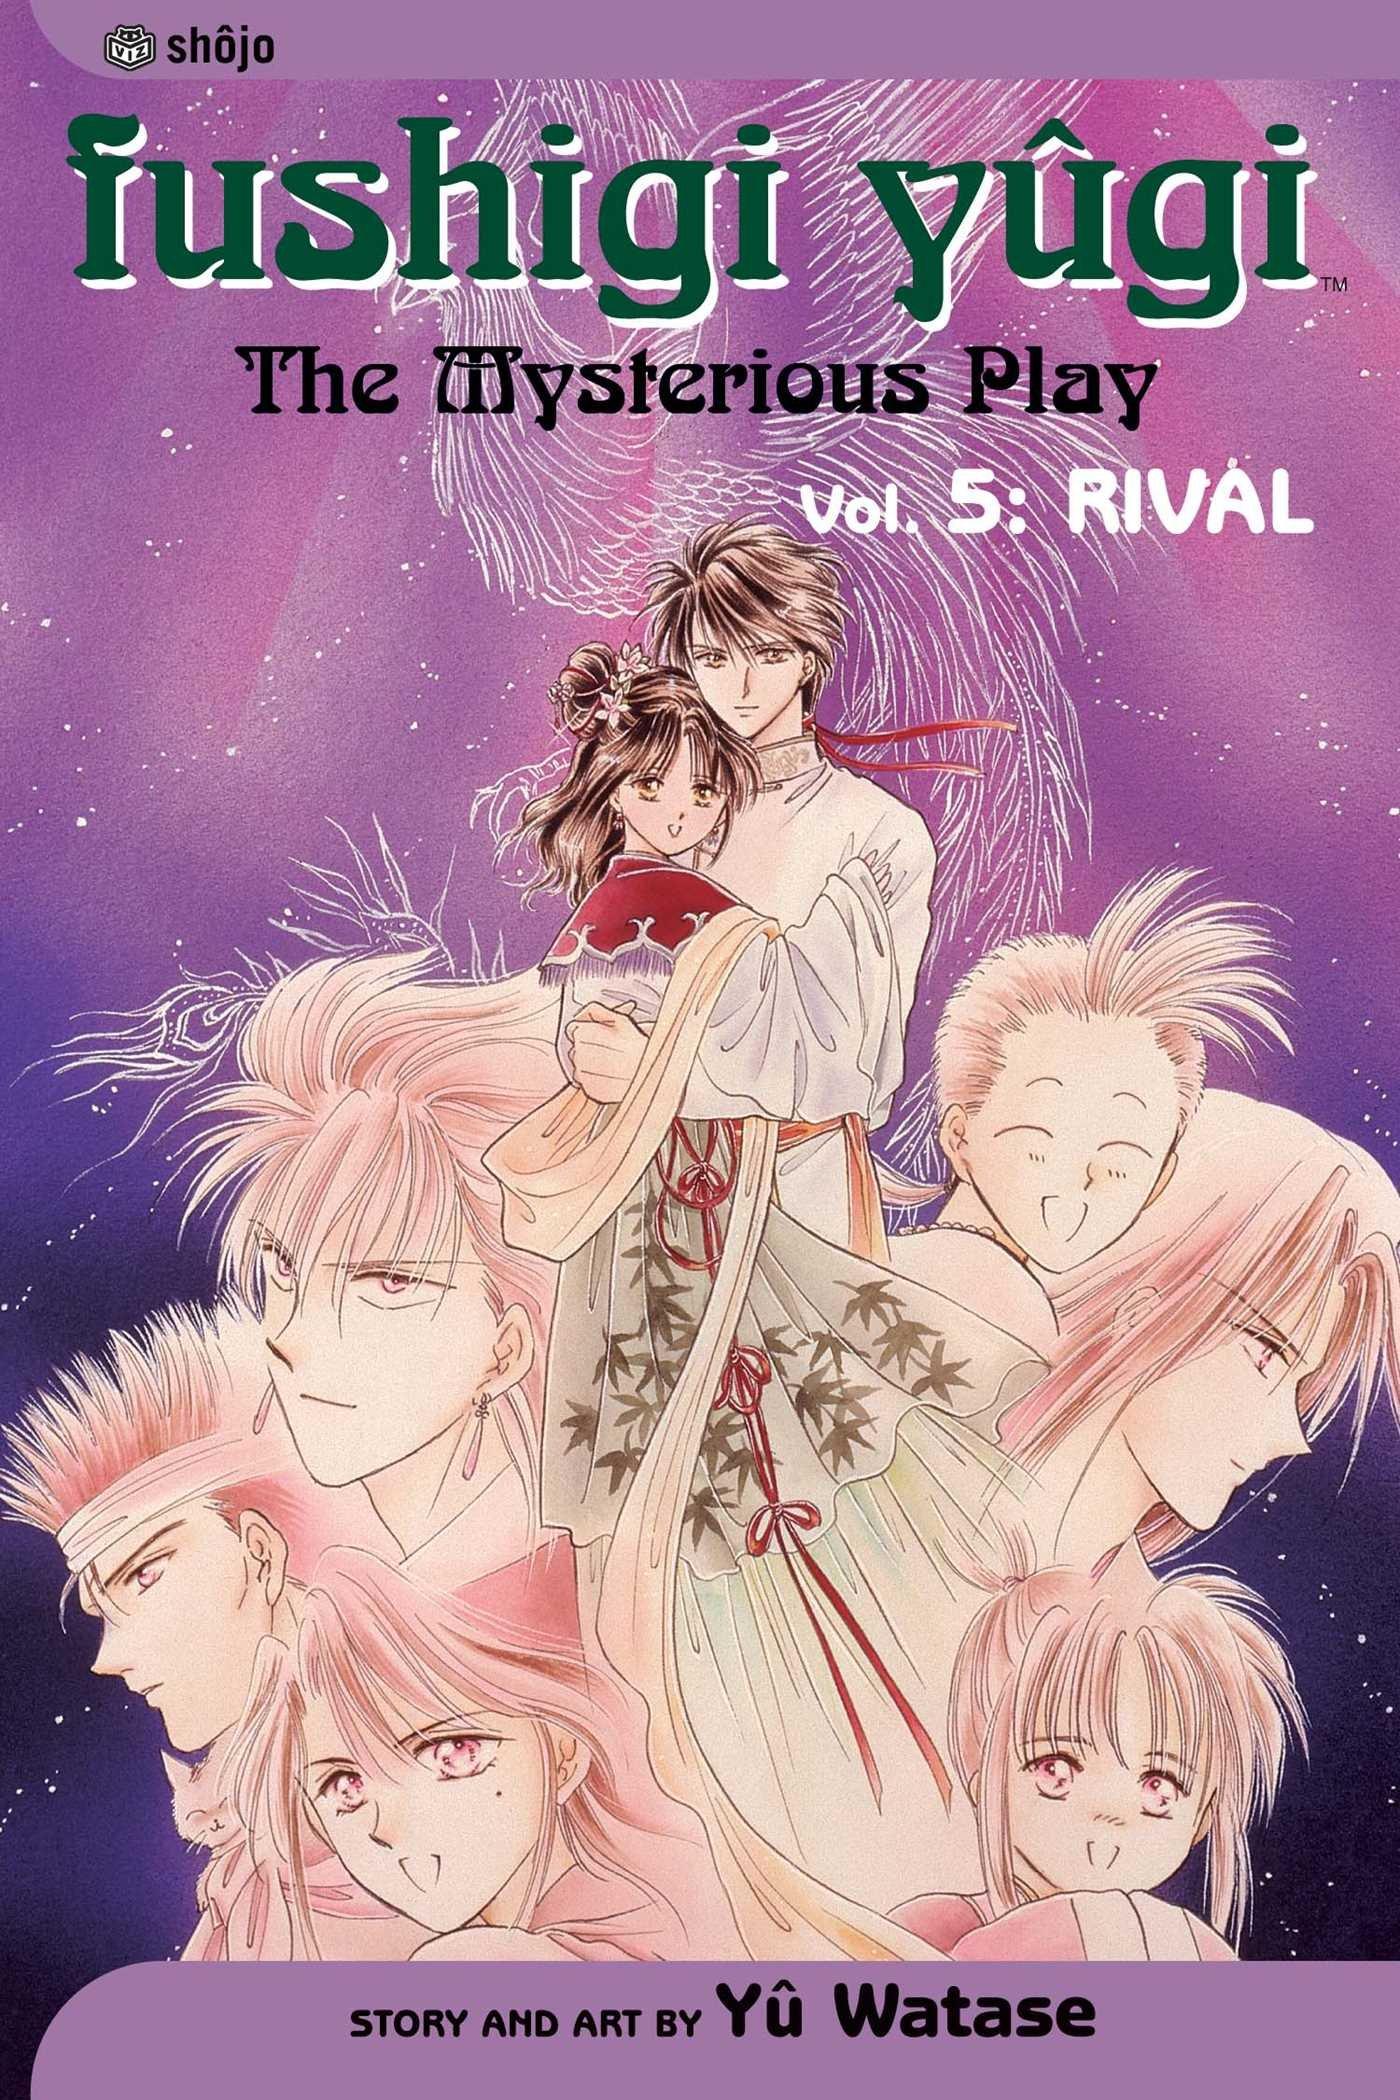 Download Fushigi Yugi: The Mysterious Play, Vol. 5 - Rival pdf